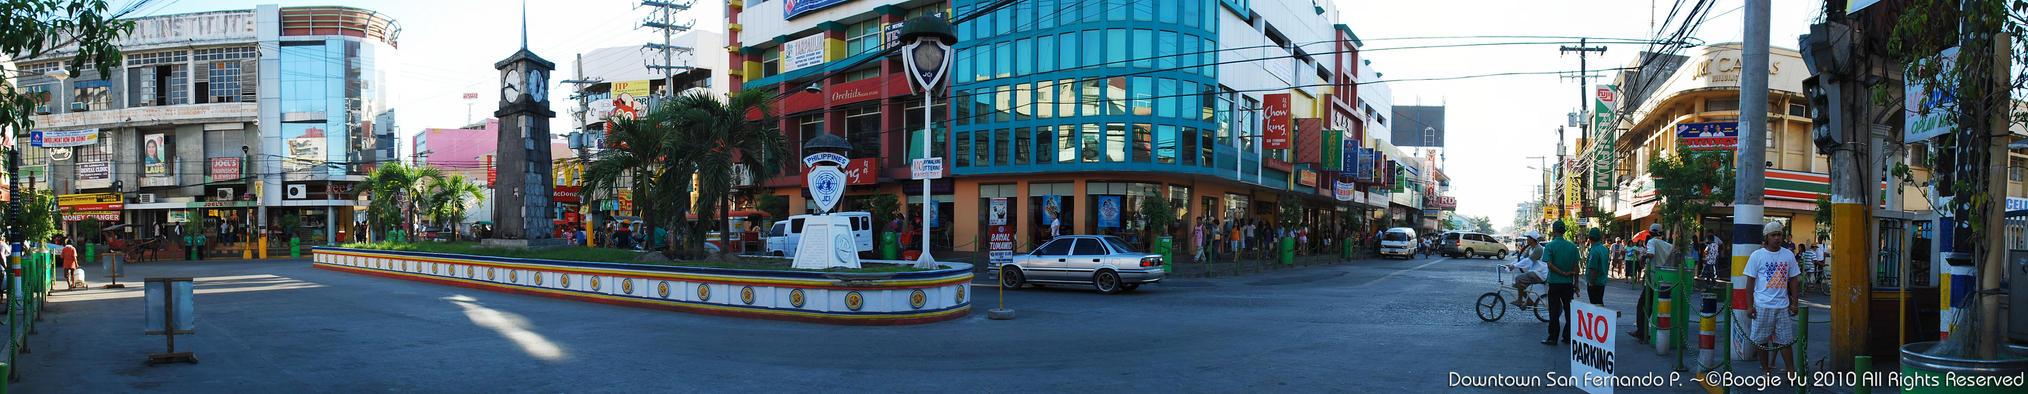 Downtown San Fernando.2 by bogskiii